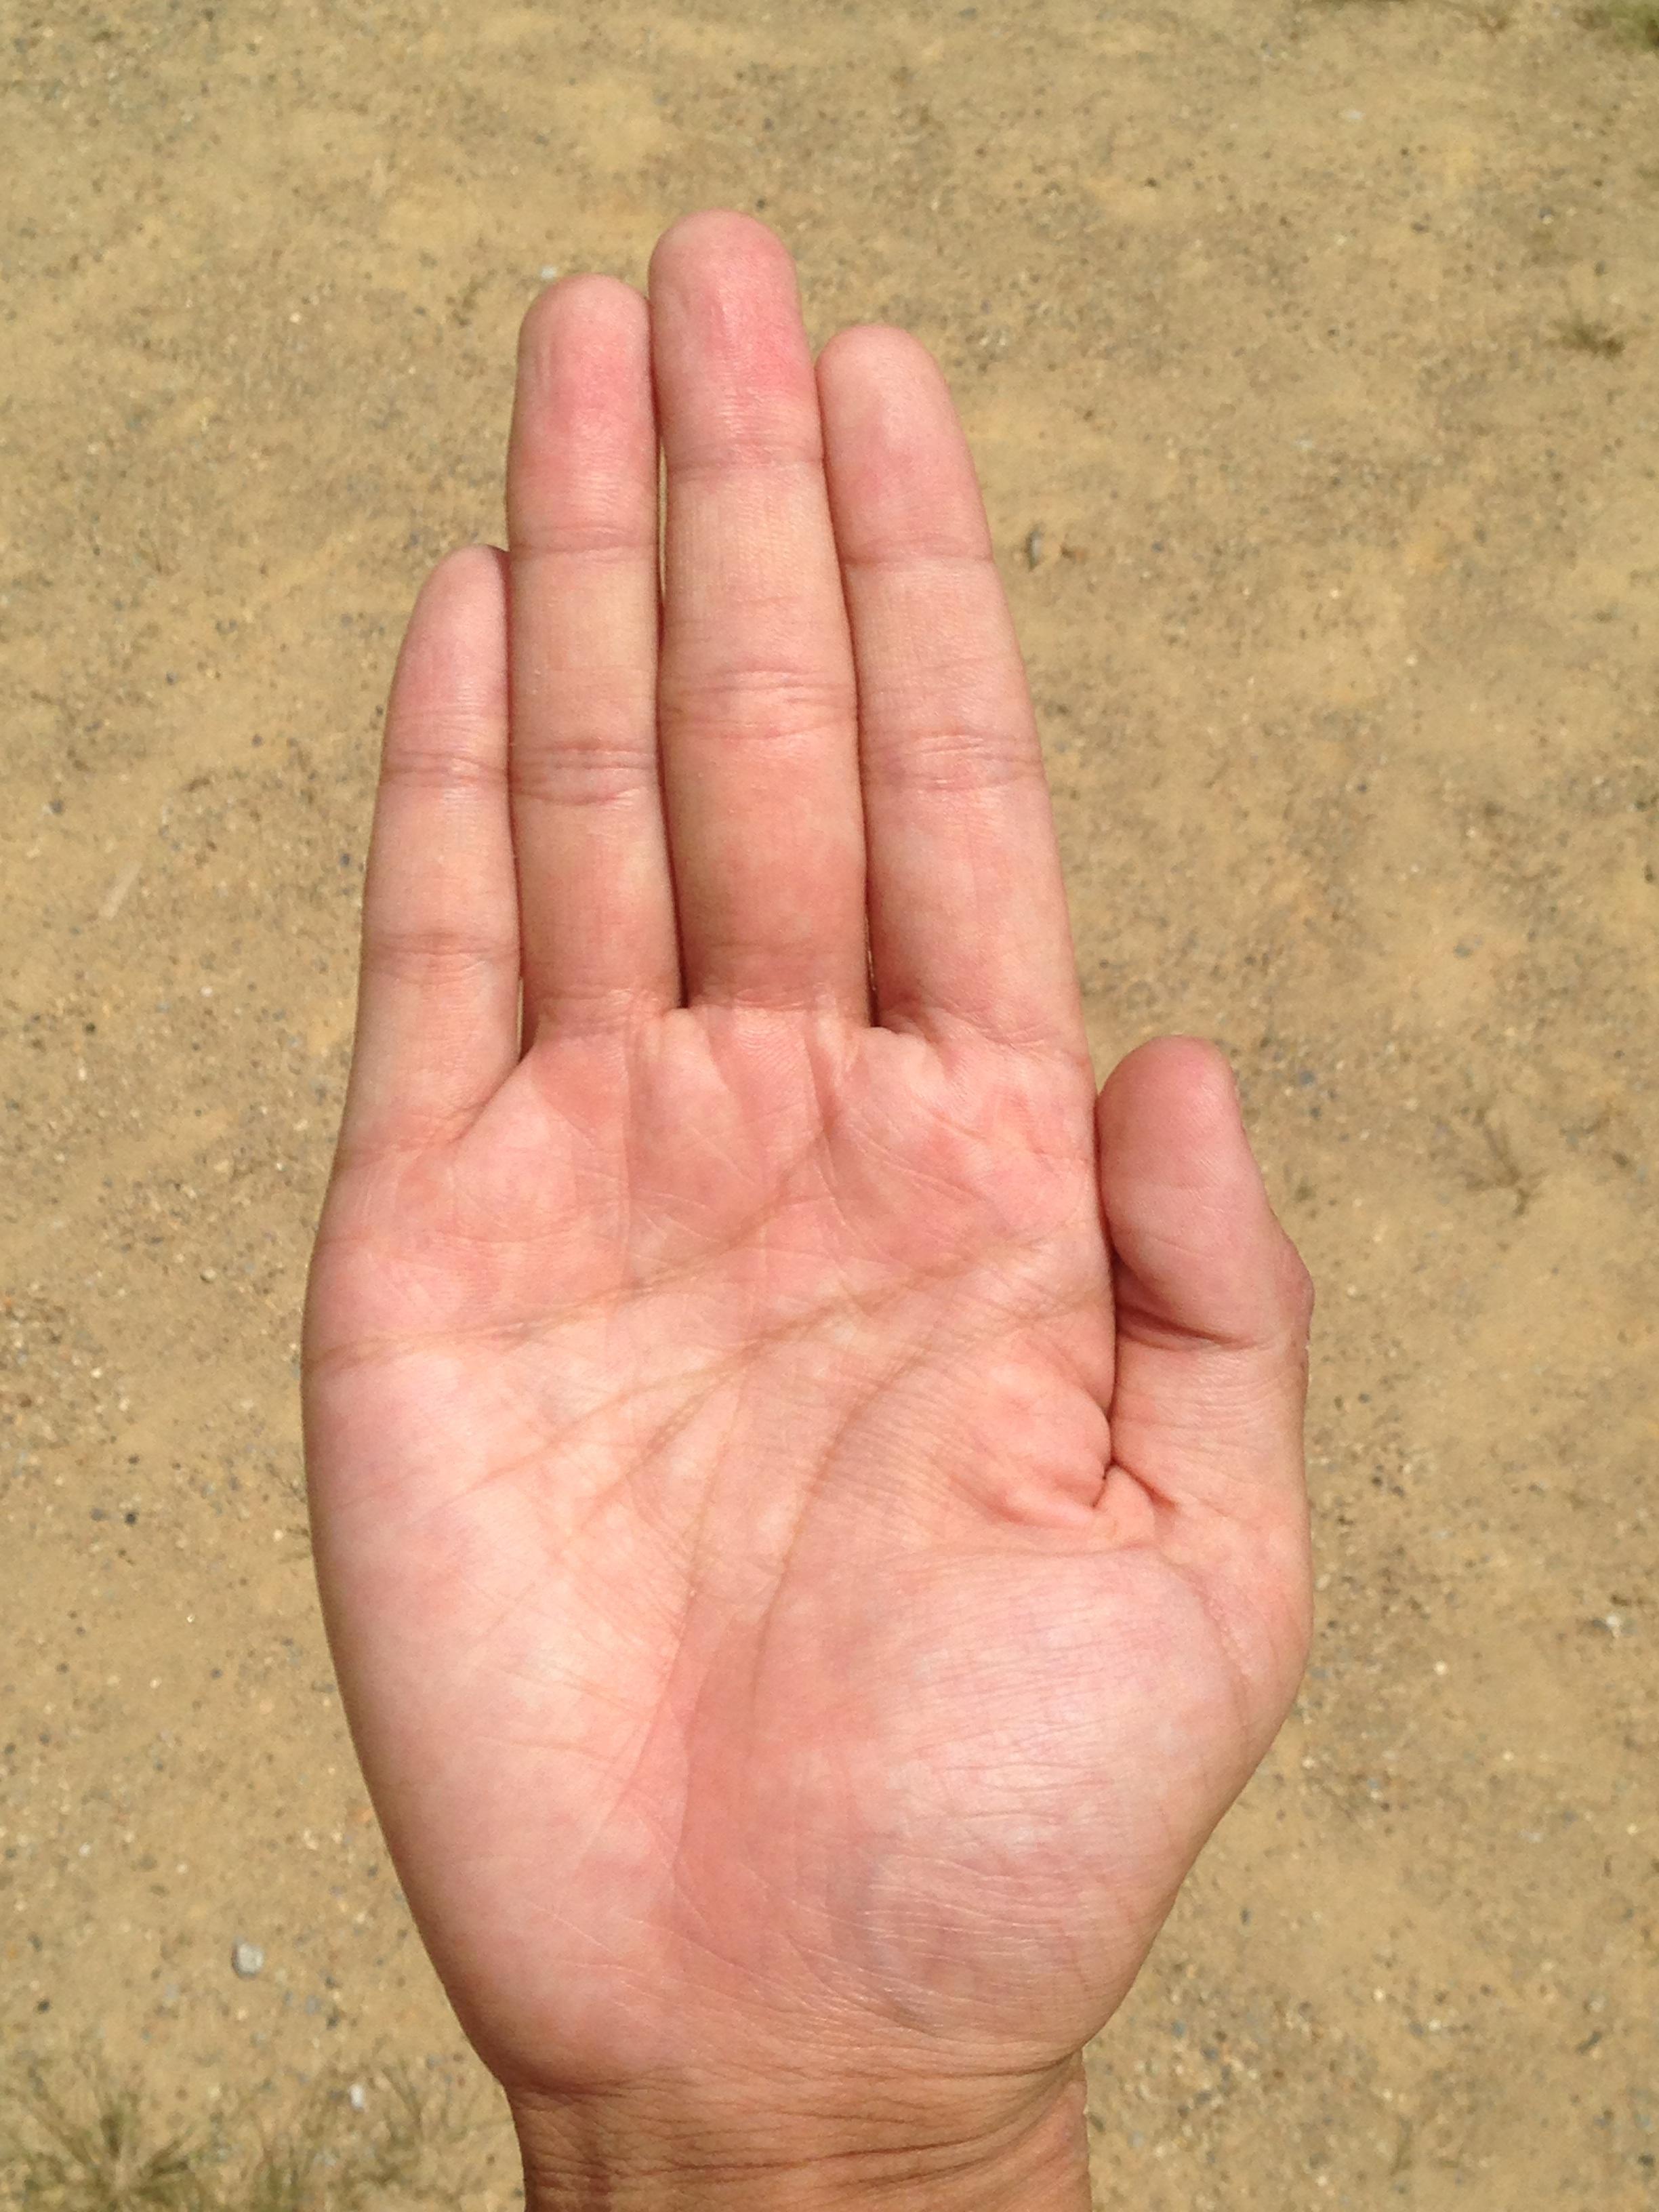 Hand Screen Man Beach Sea Coast People Woman Pot Male Leg Young Finger Reflection Palm Soil